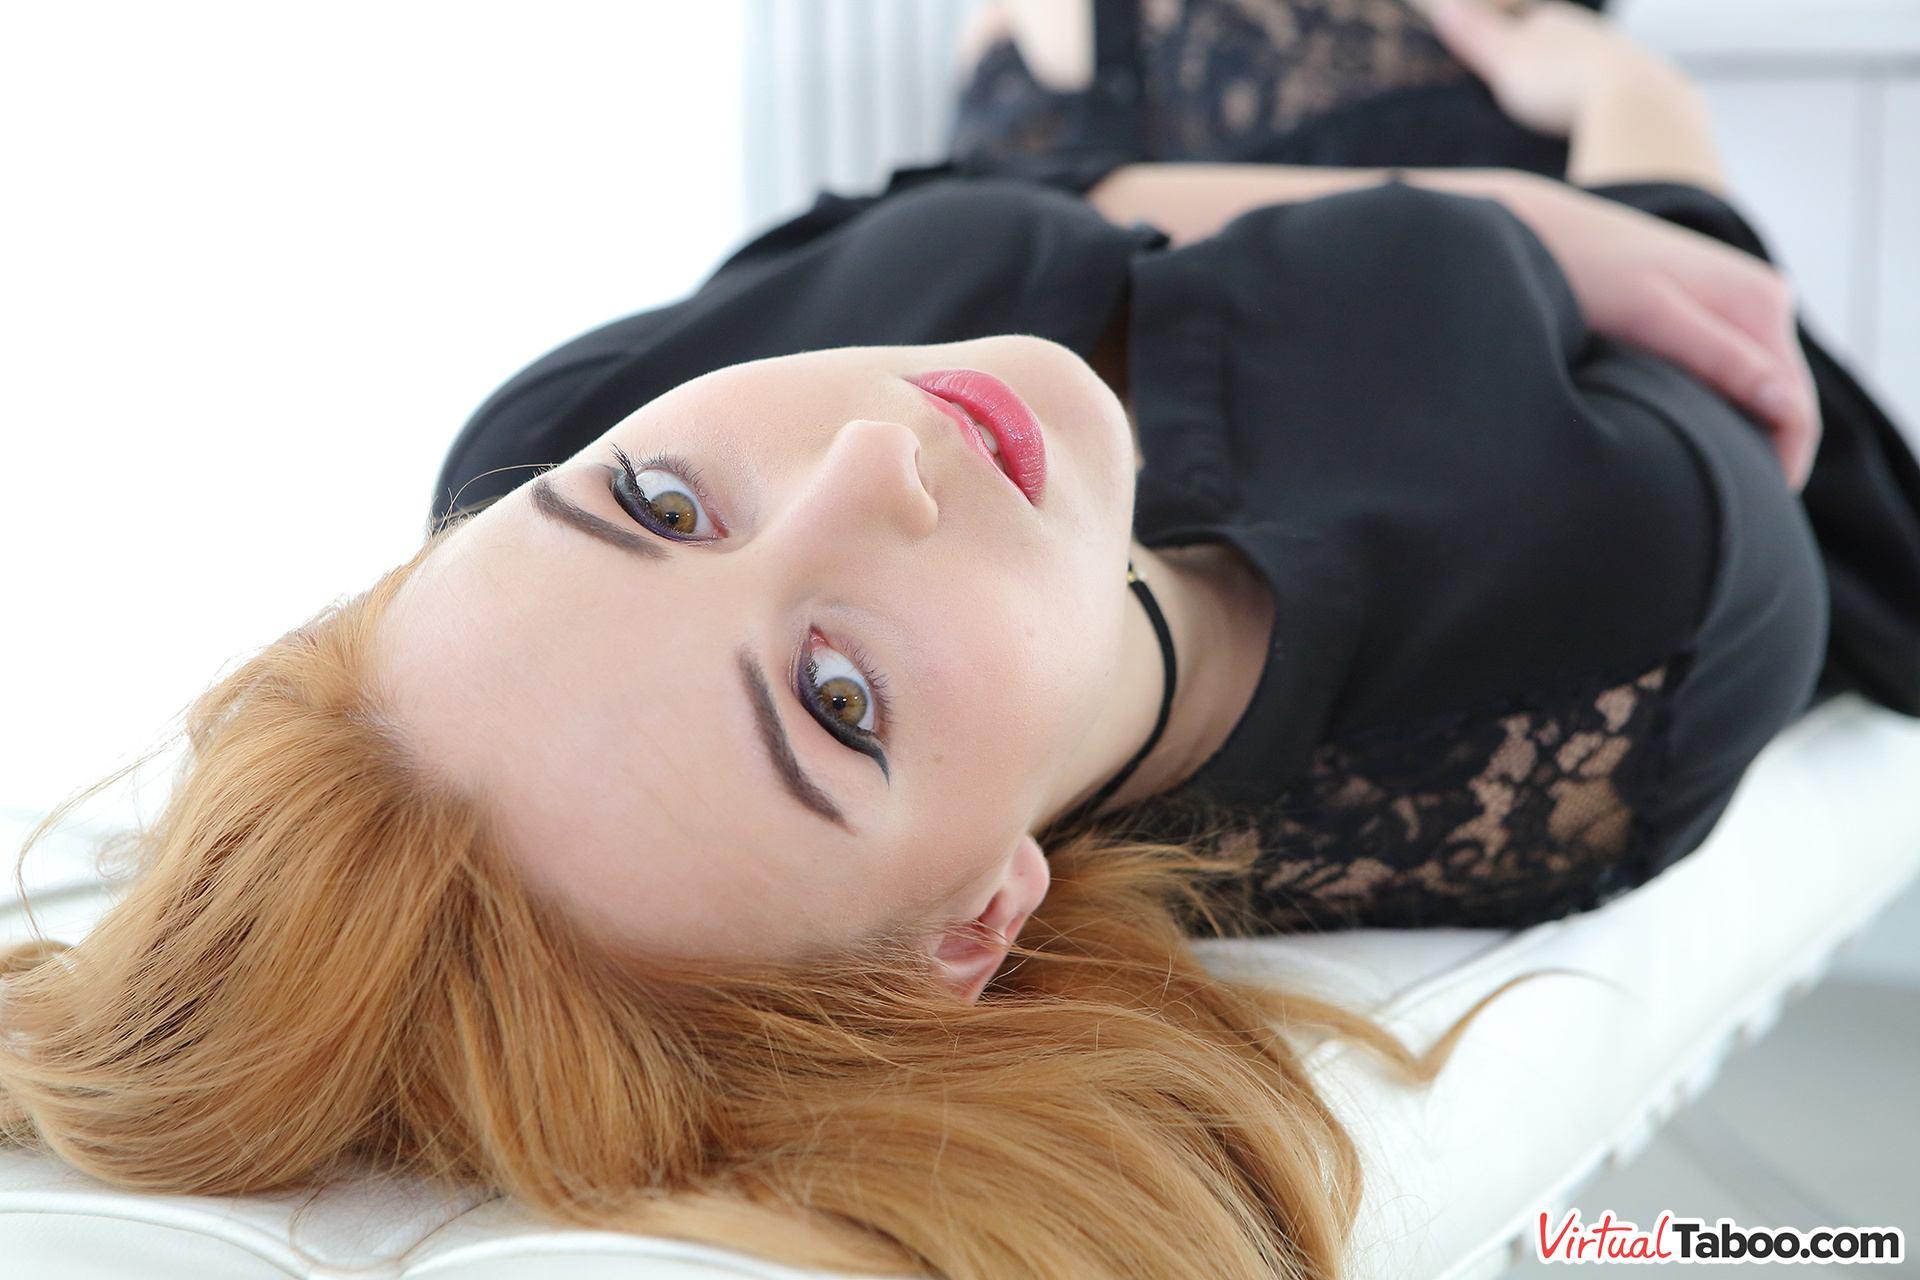 Red Bird Takes Flight - Top 2 Hottest Ukrainian Pornstars of the Spring vr porn blog virtual reality